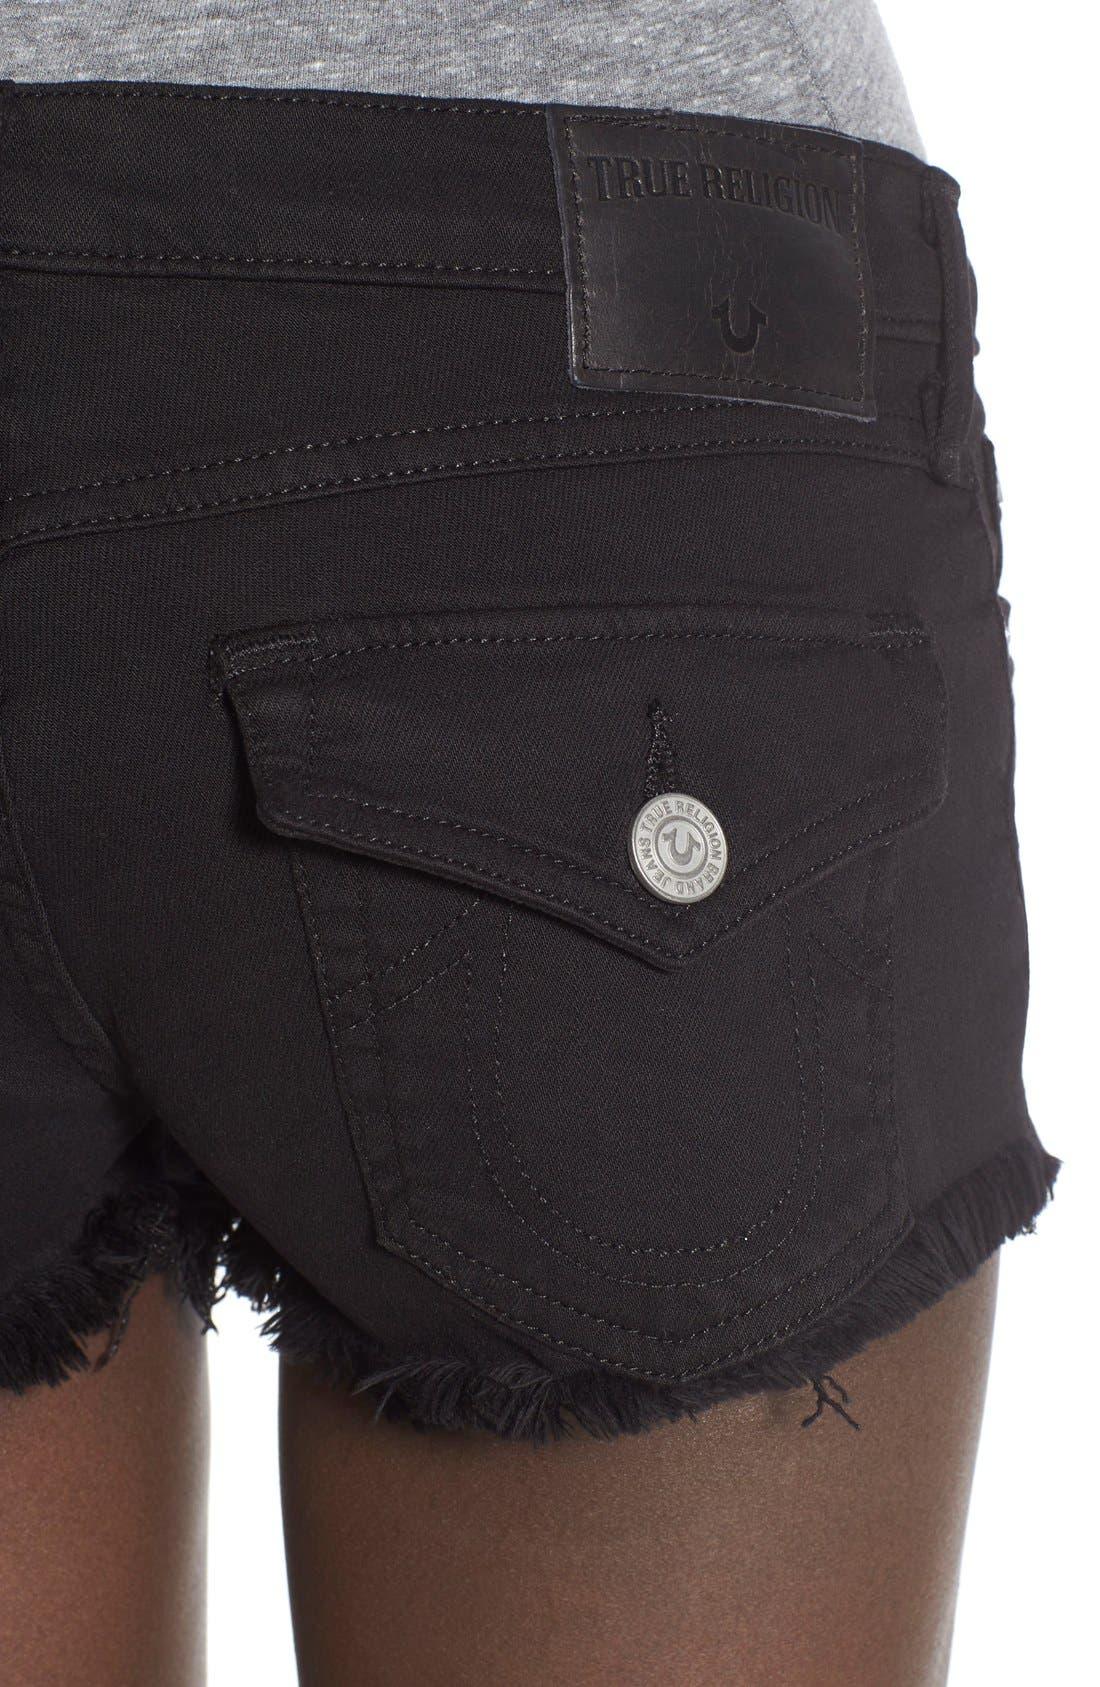 Alternate Image 4  - True Religion Brand Jeans Joey Flap Pocket Cutoff Denim Shorts (Jet Black)